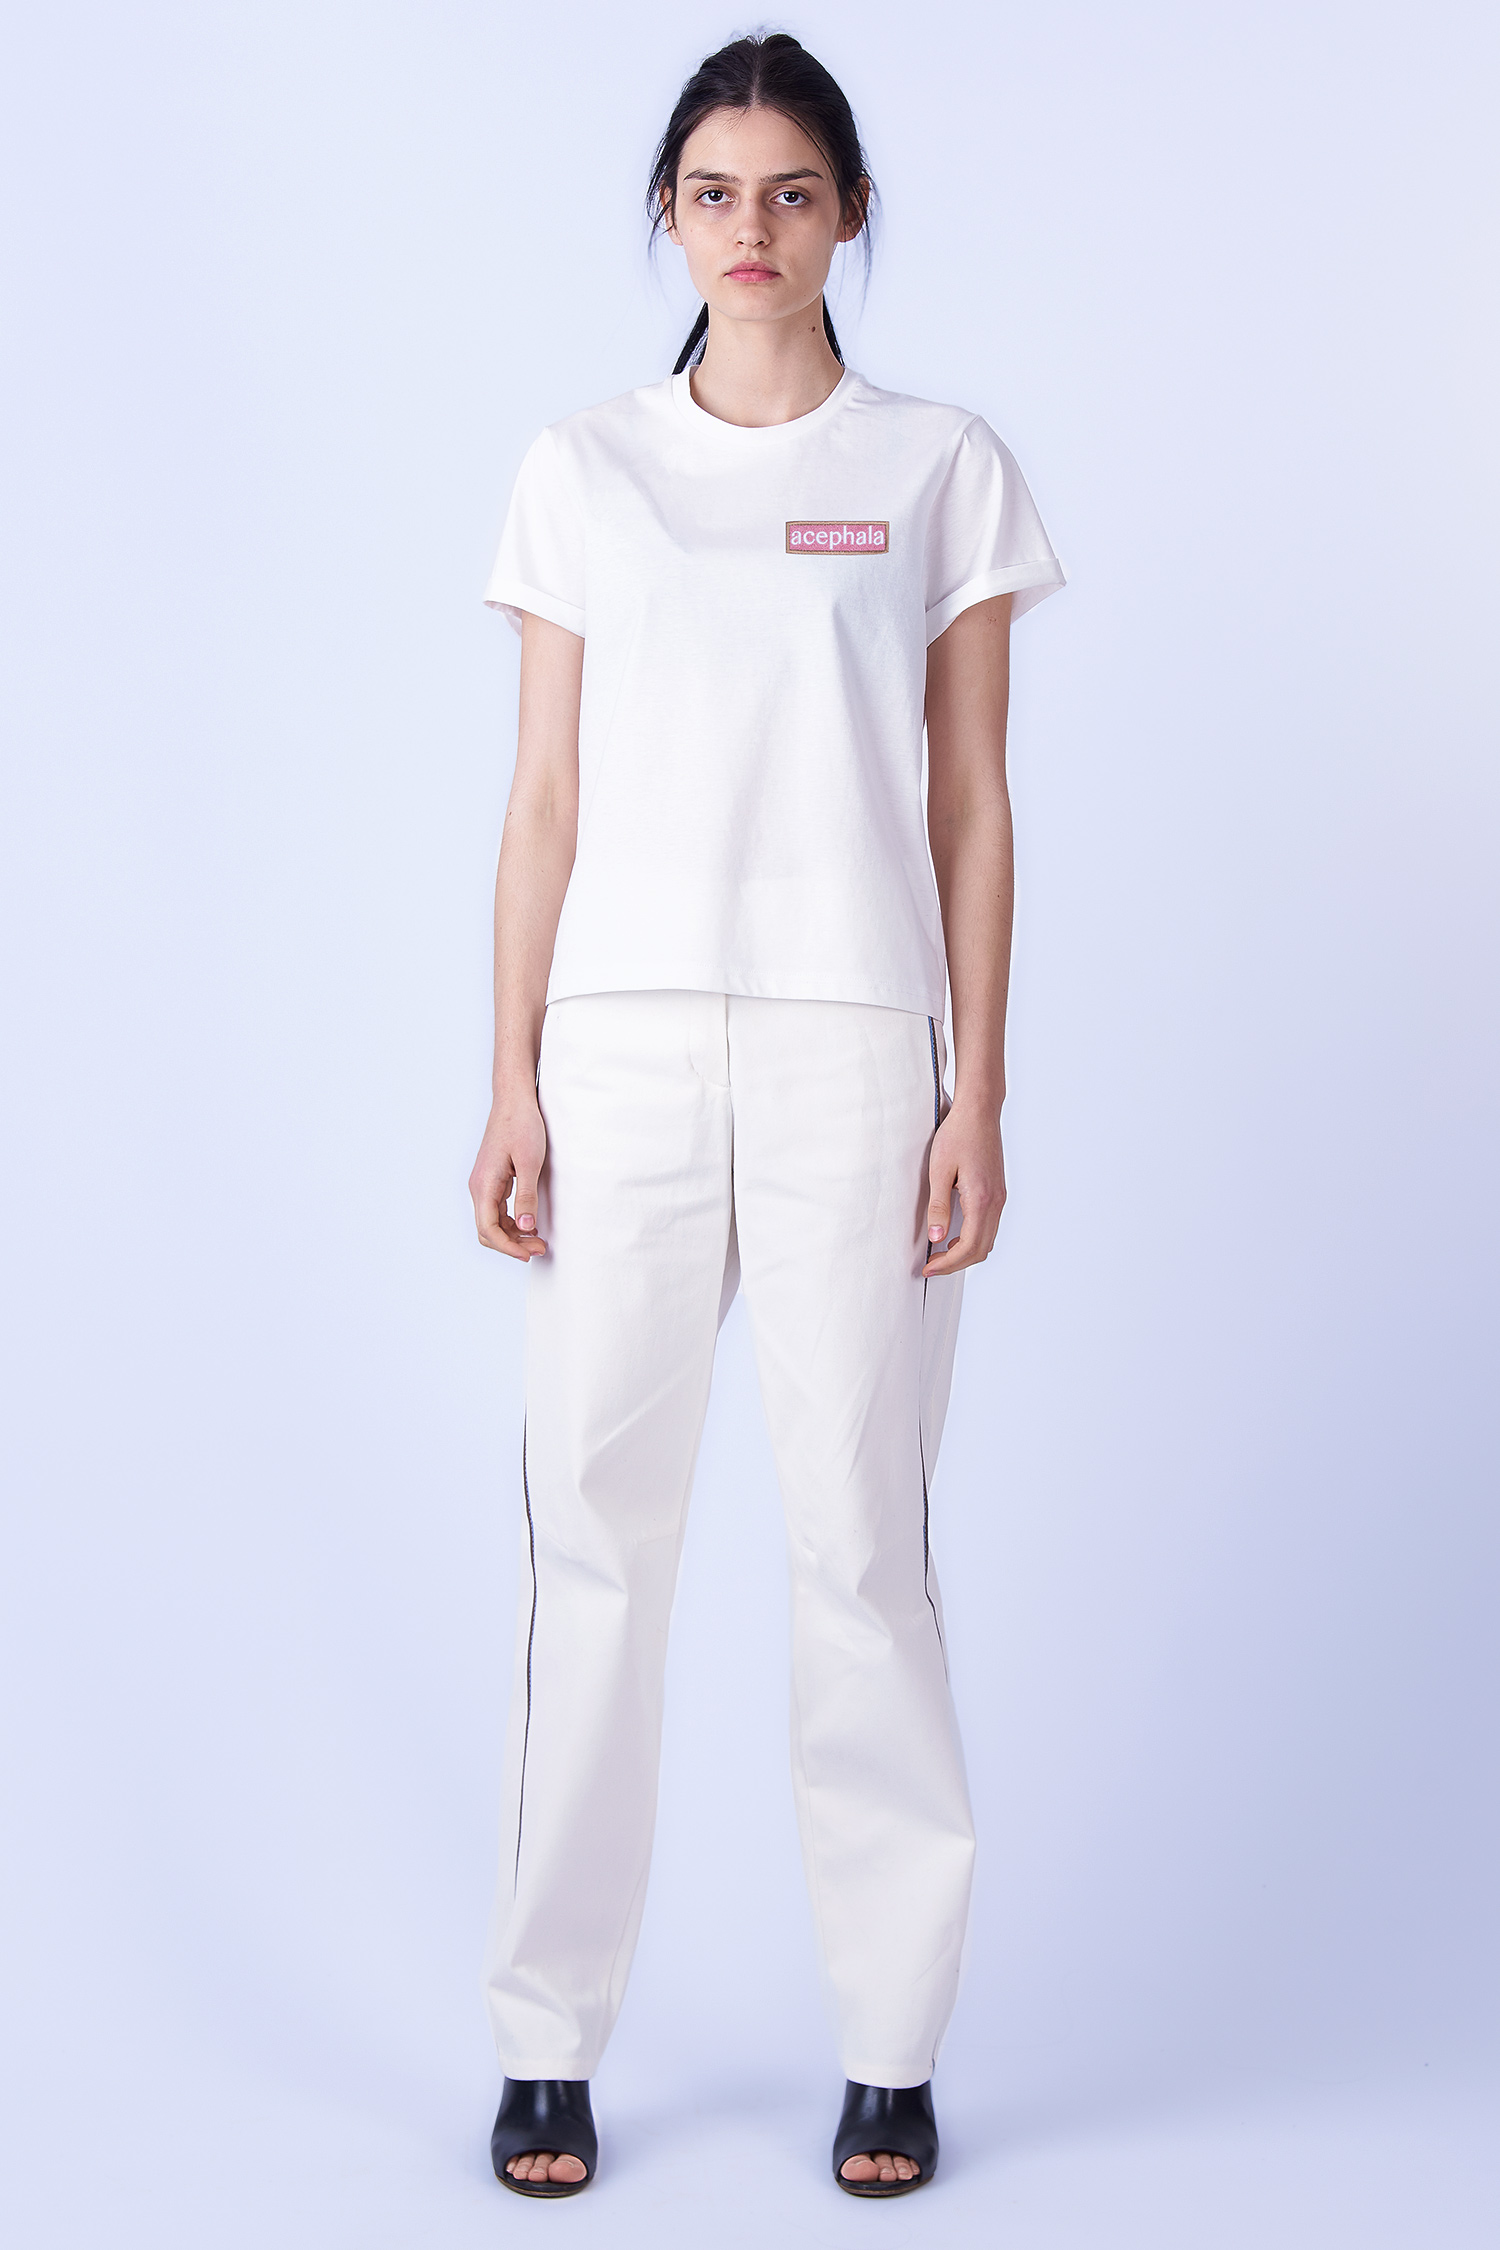 Acephala SS2019 Slavic Goddesses White Patch T Shirt Biała Koszulka z Naszywką Front